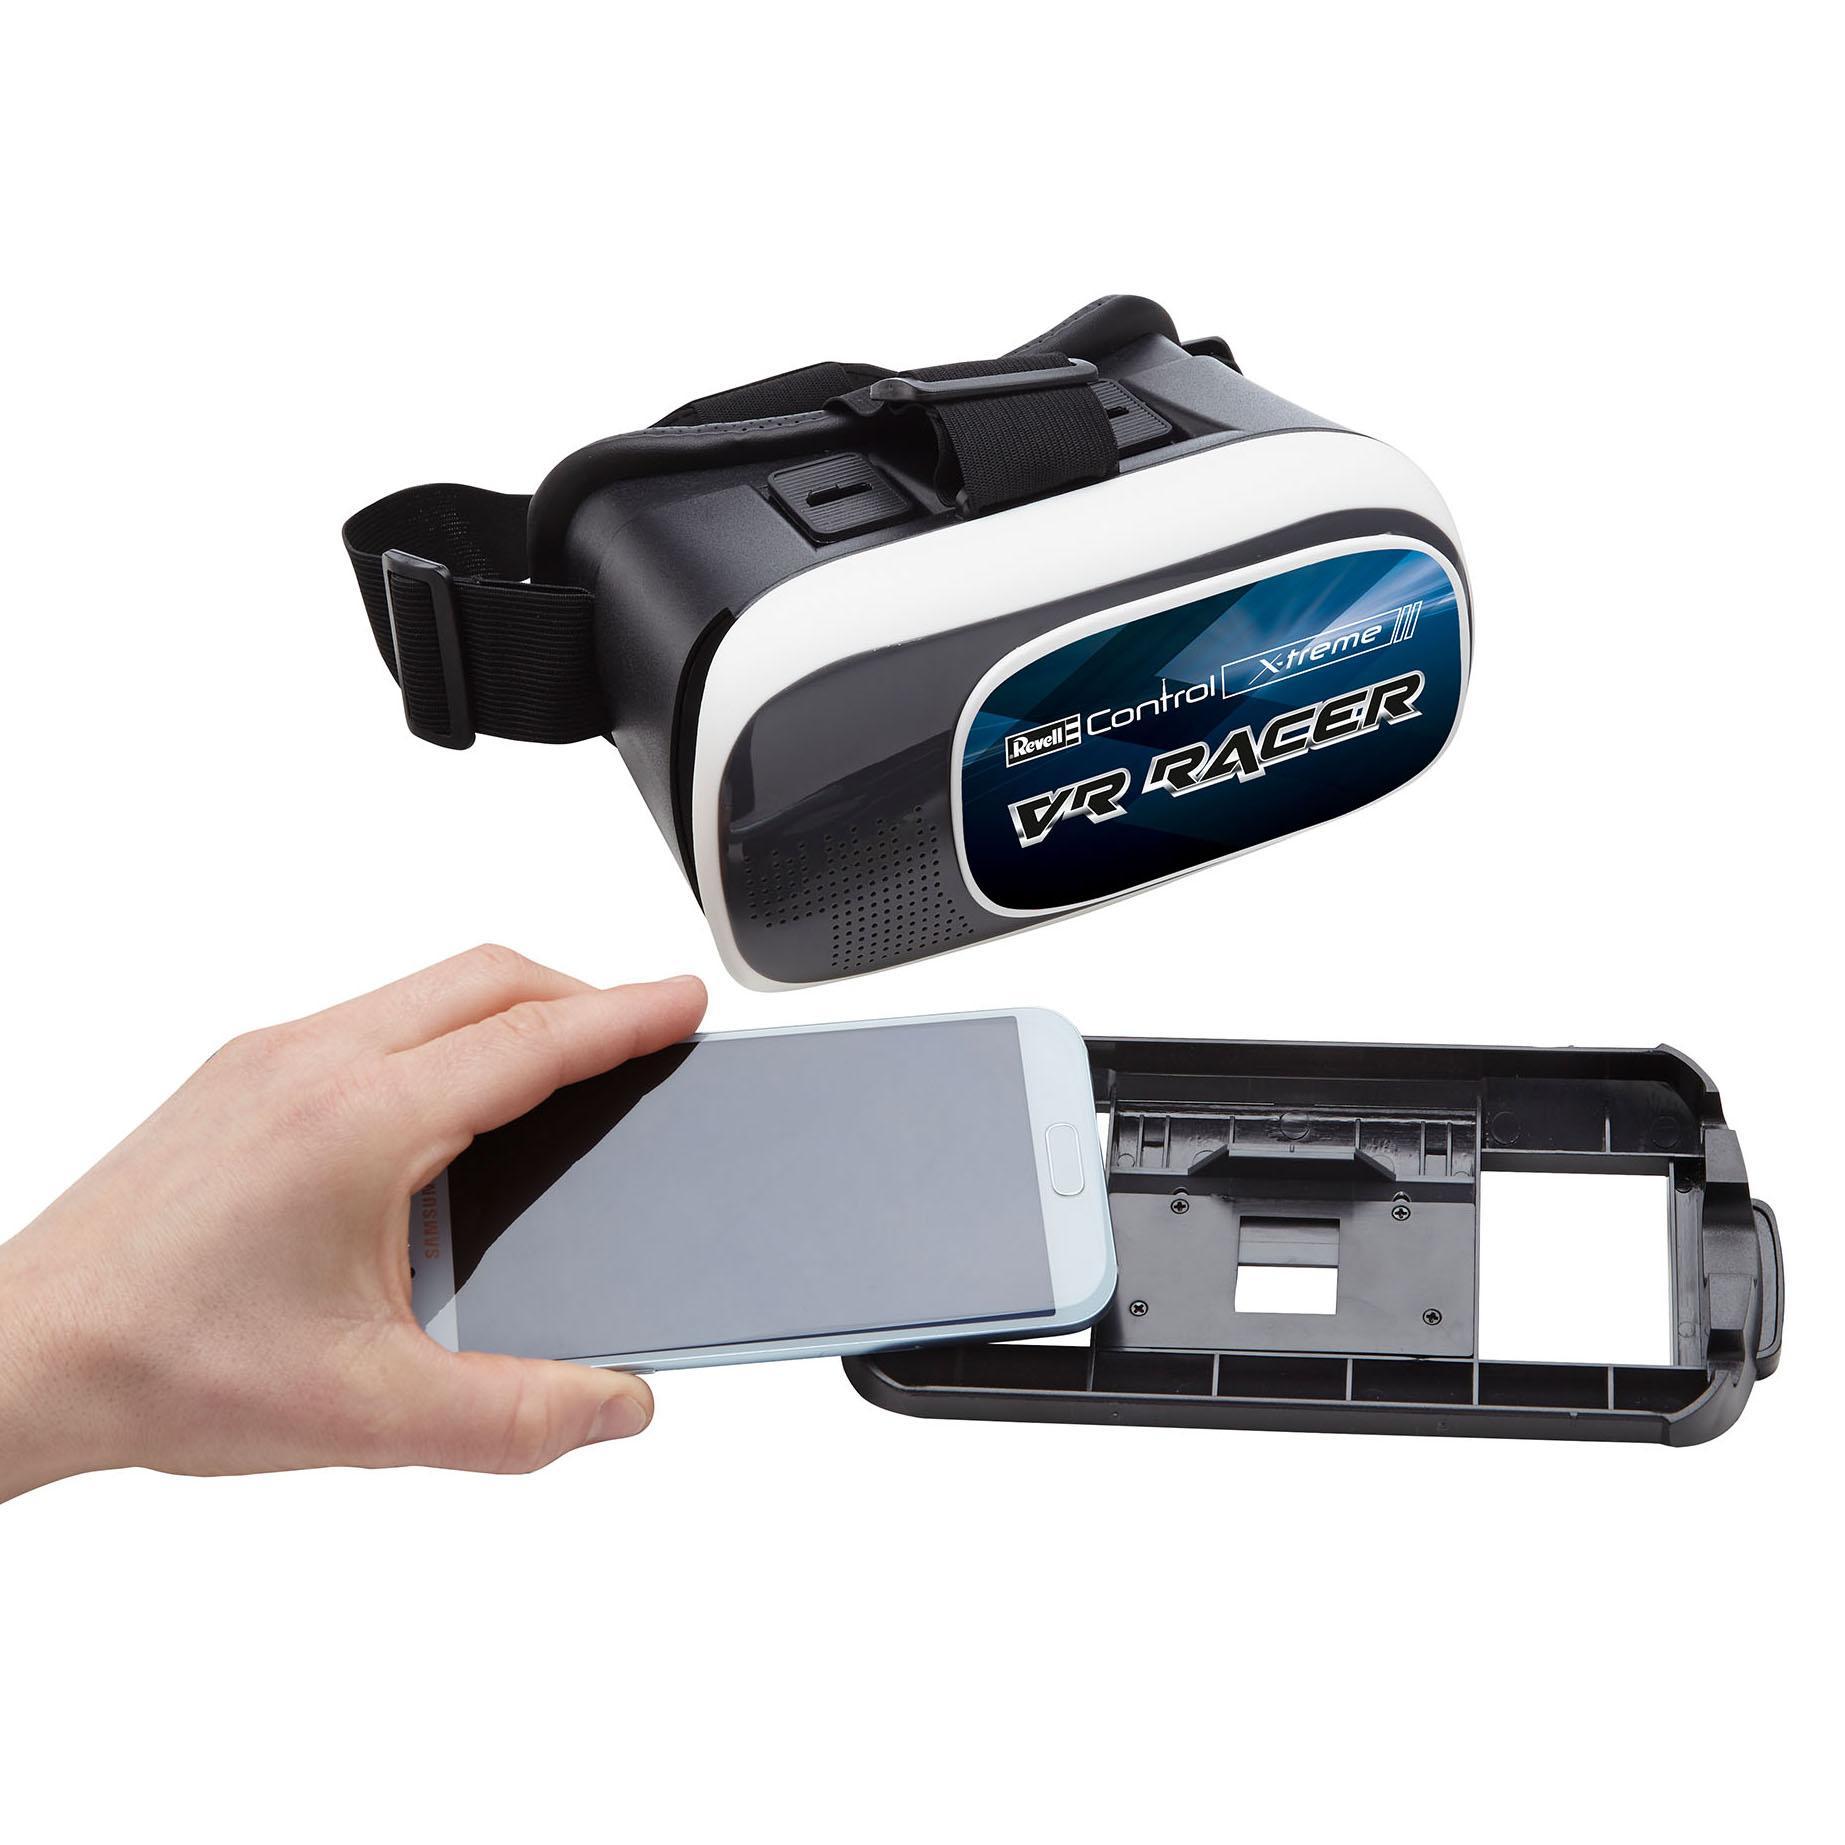 revell control x treme 24817 rc car mit fpv kamera und. Black Bedroom Furniture Sets. Home Design Ideas